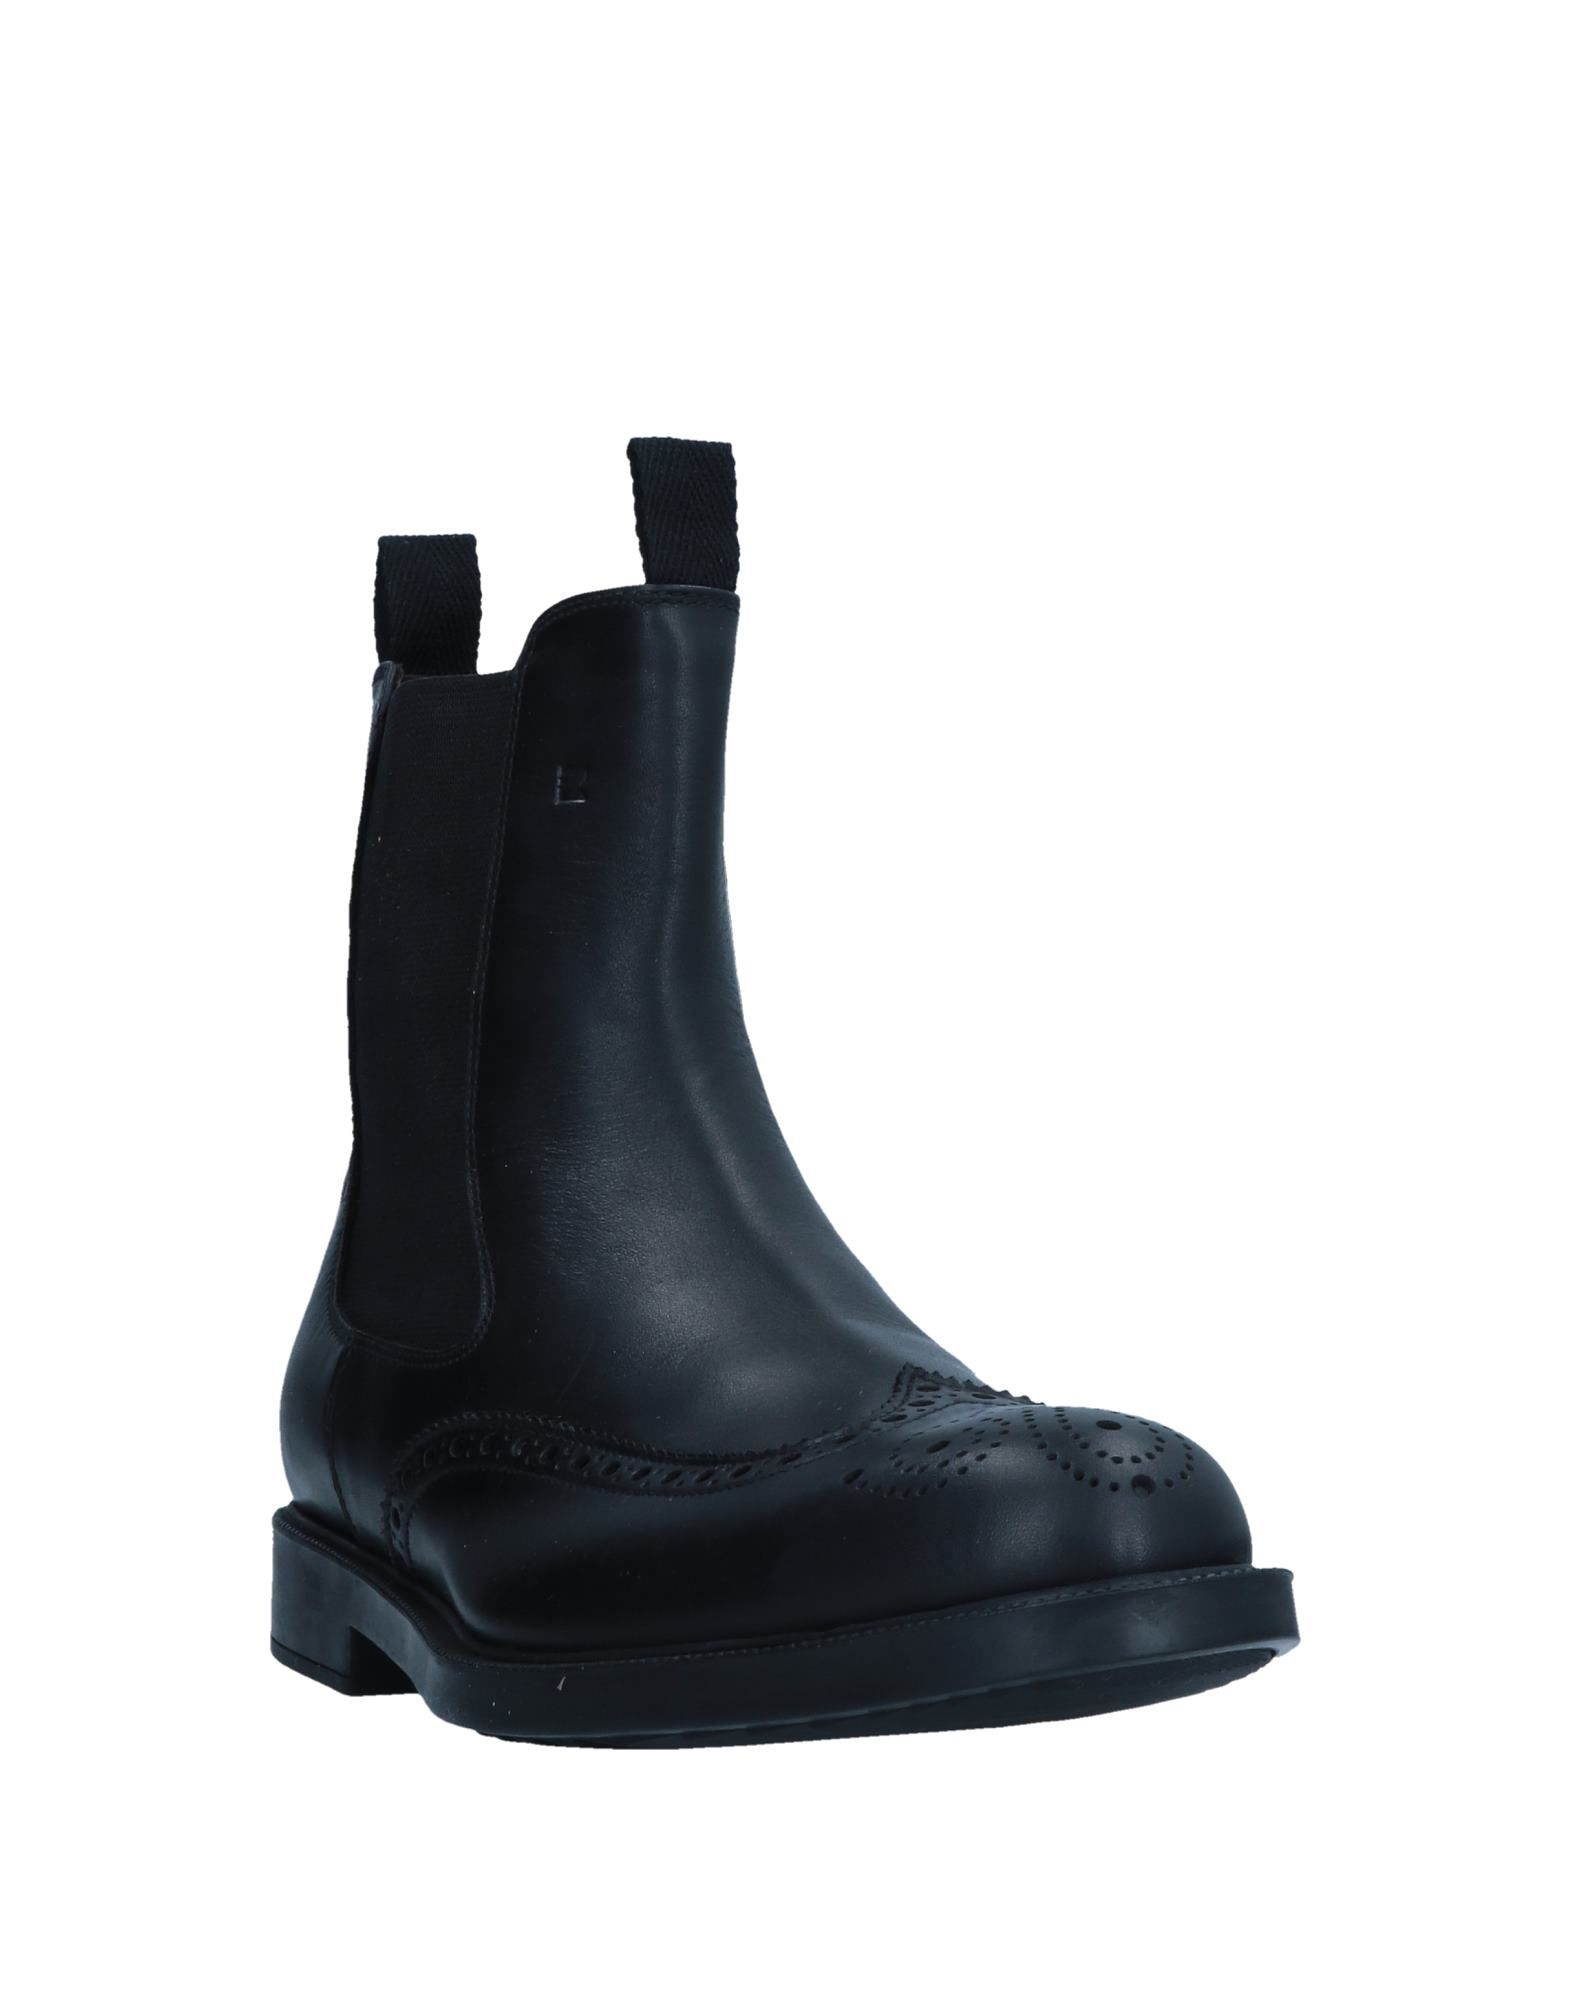 Fratelli Rossetti Stiefelette Qualität Herren  11550087BK Gute Qualität Stiefelette beliebte Schuhe 66eb0a